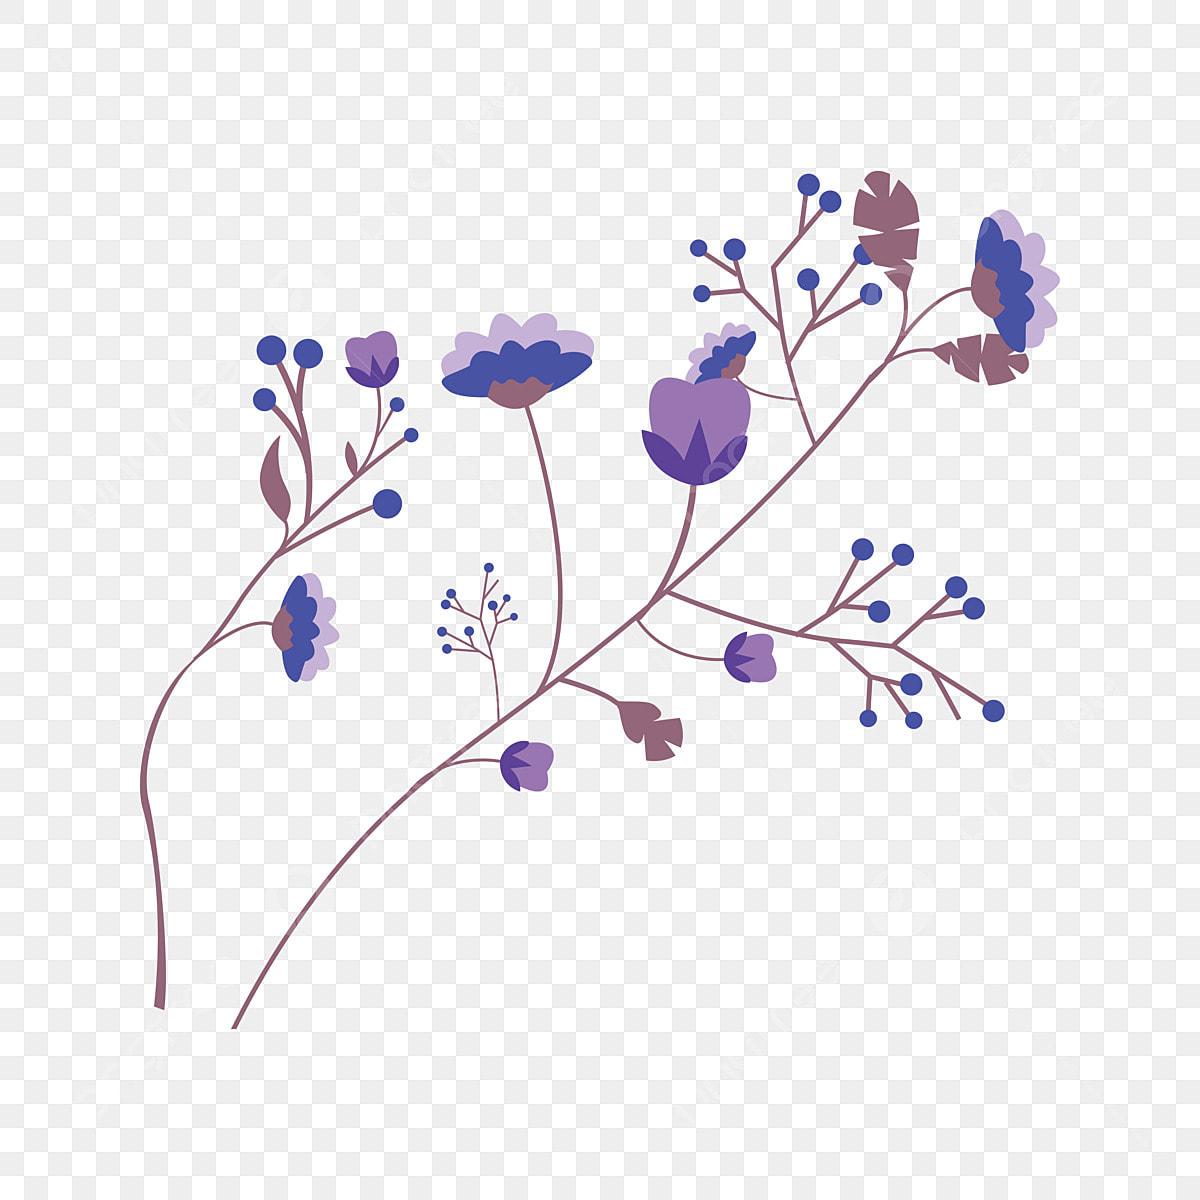 Rose Flores Dos Desenhos Animados Flores Vaso De Buque Arranjo De